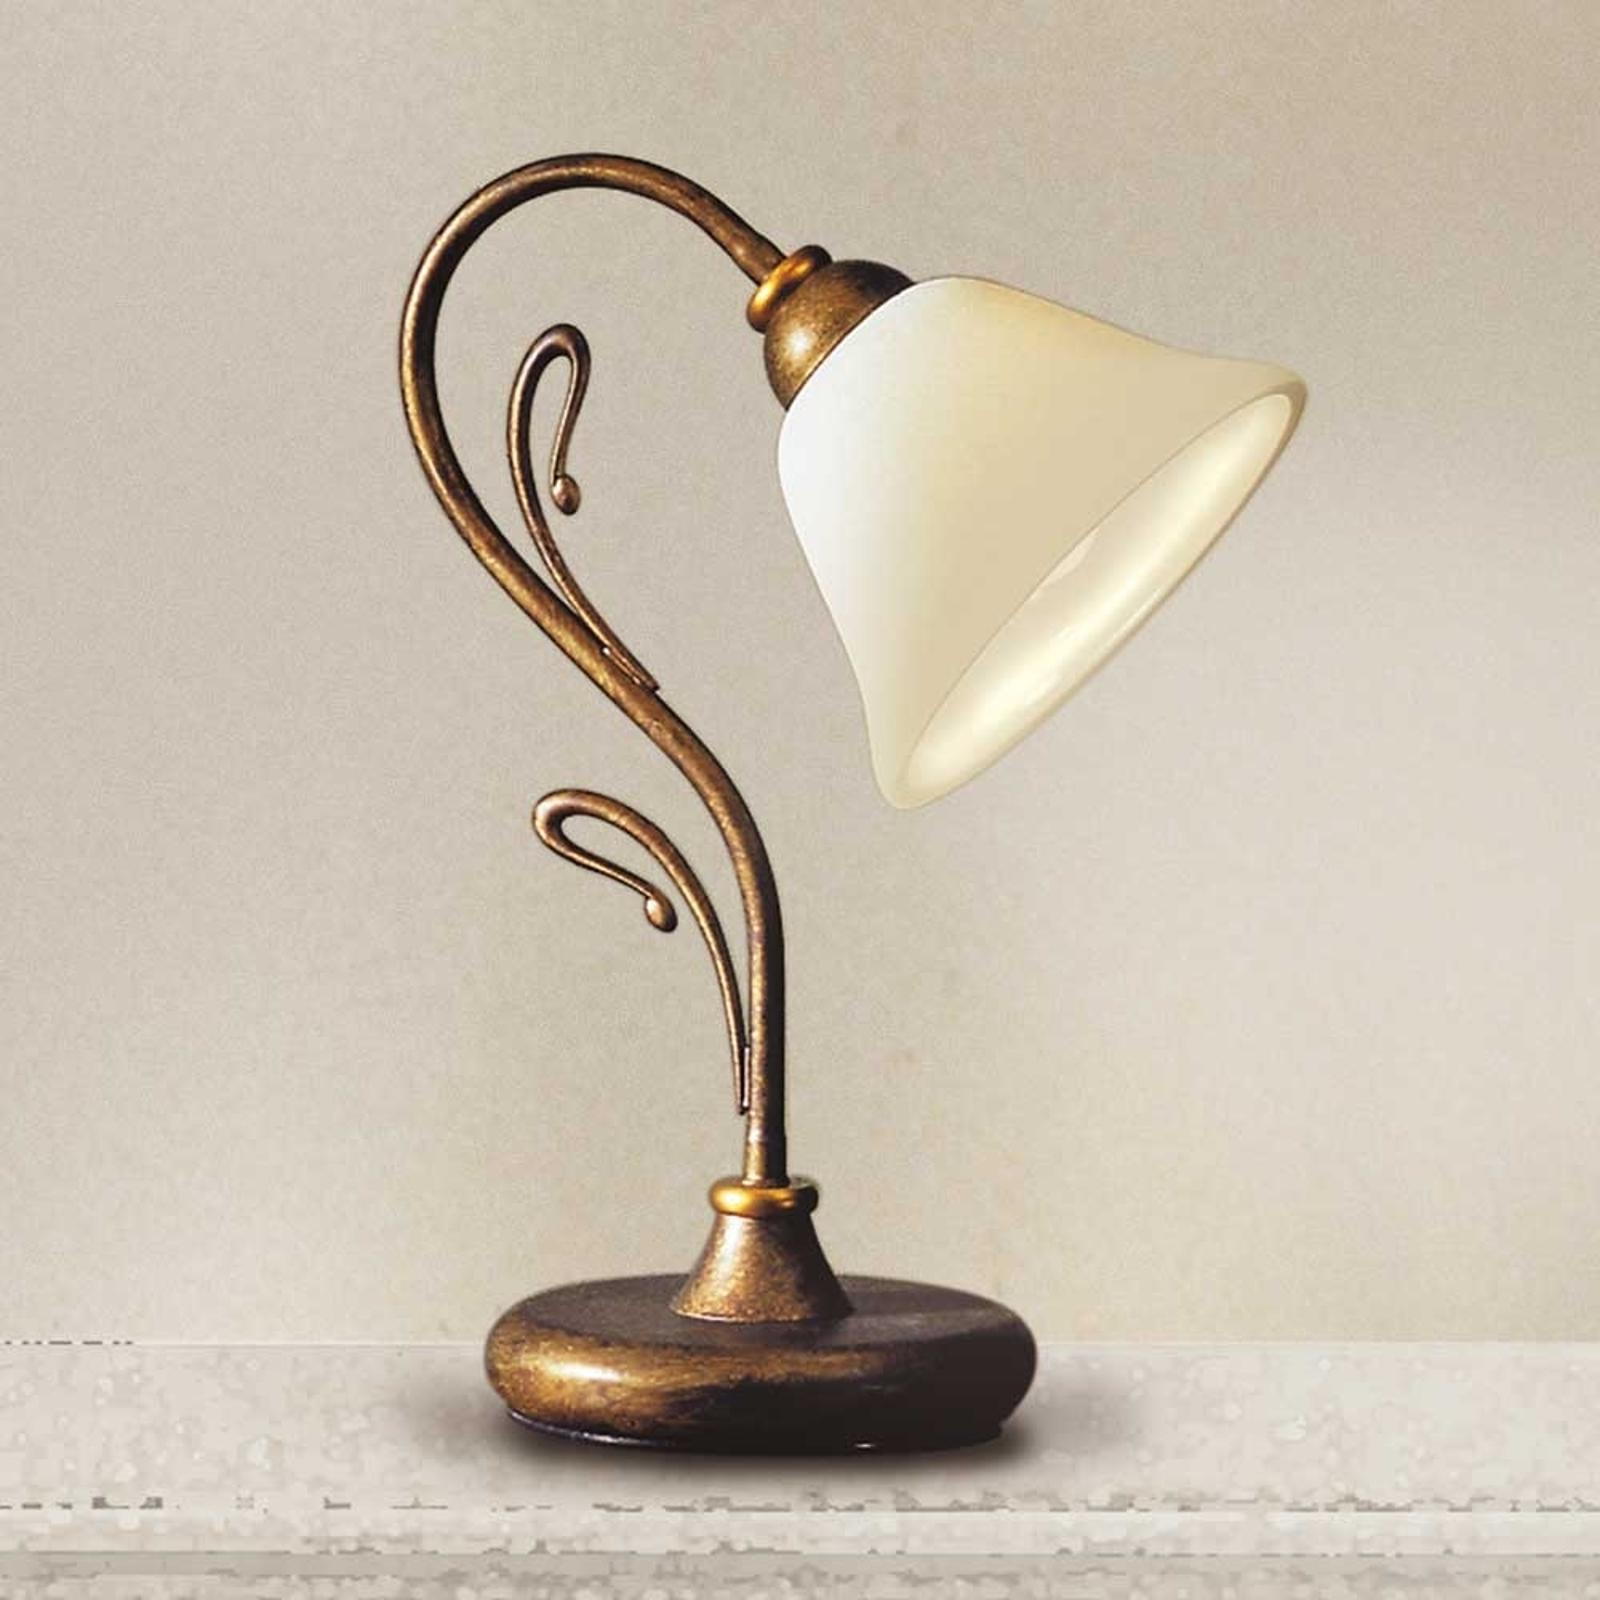 Raffinata lampada da tavolo Antonio